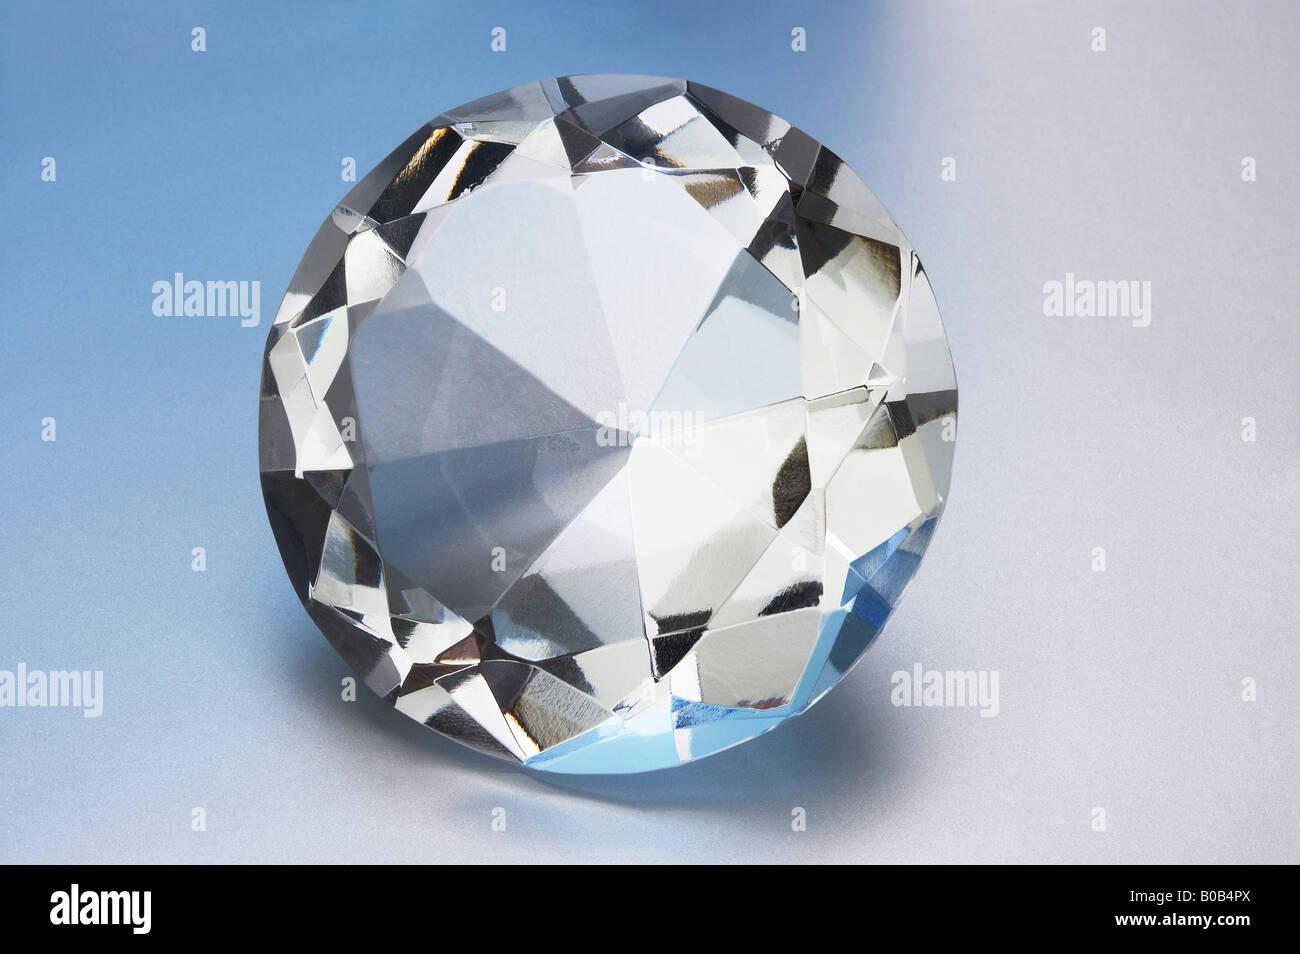 large brilliant cut diamond - Stock Image